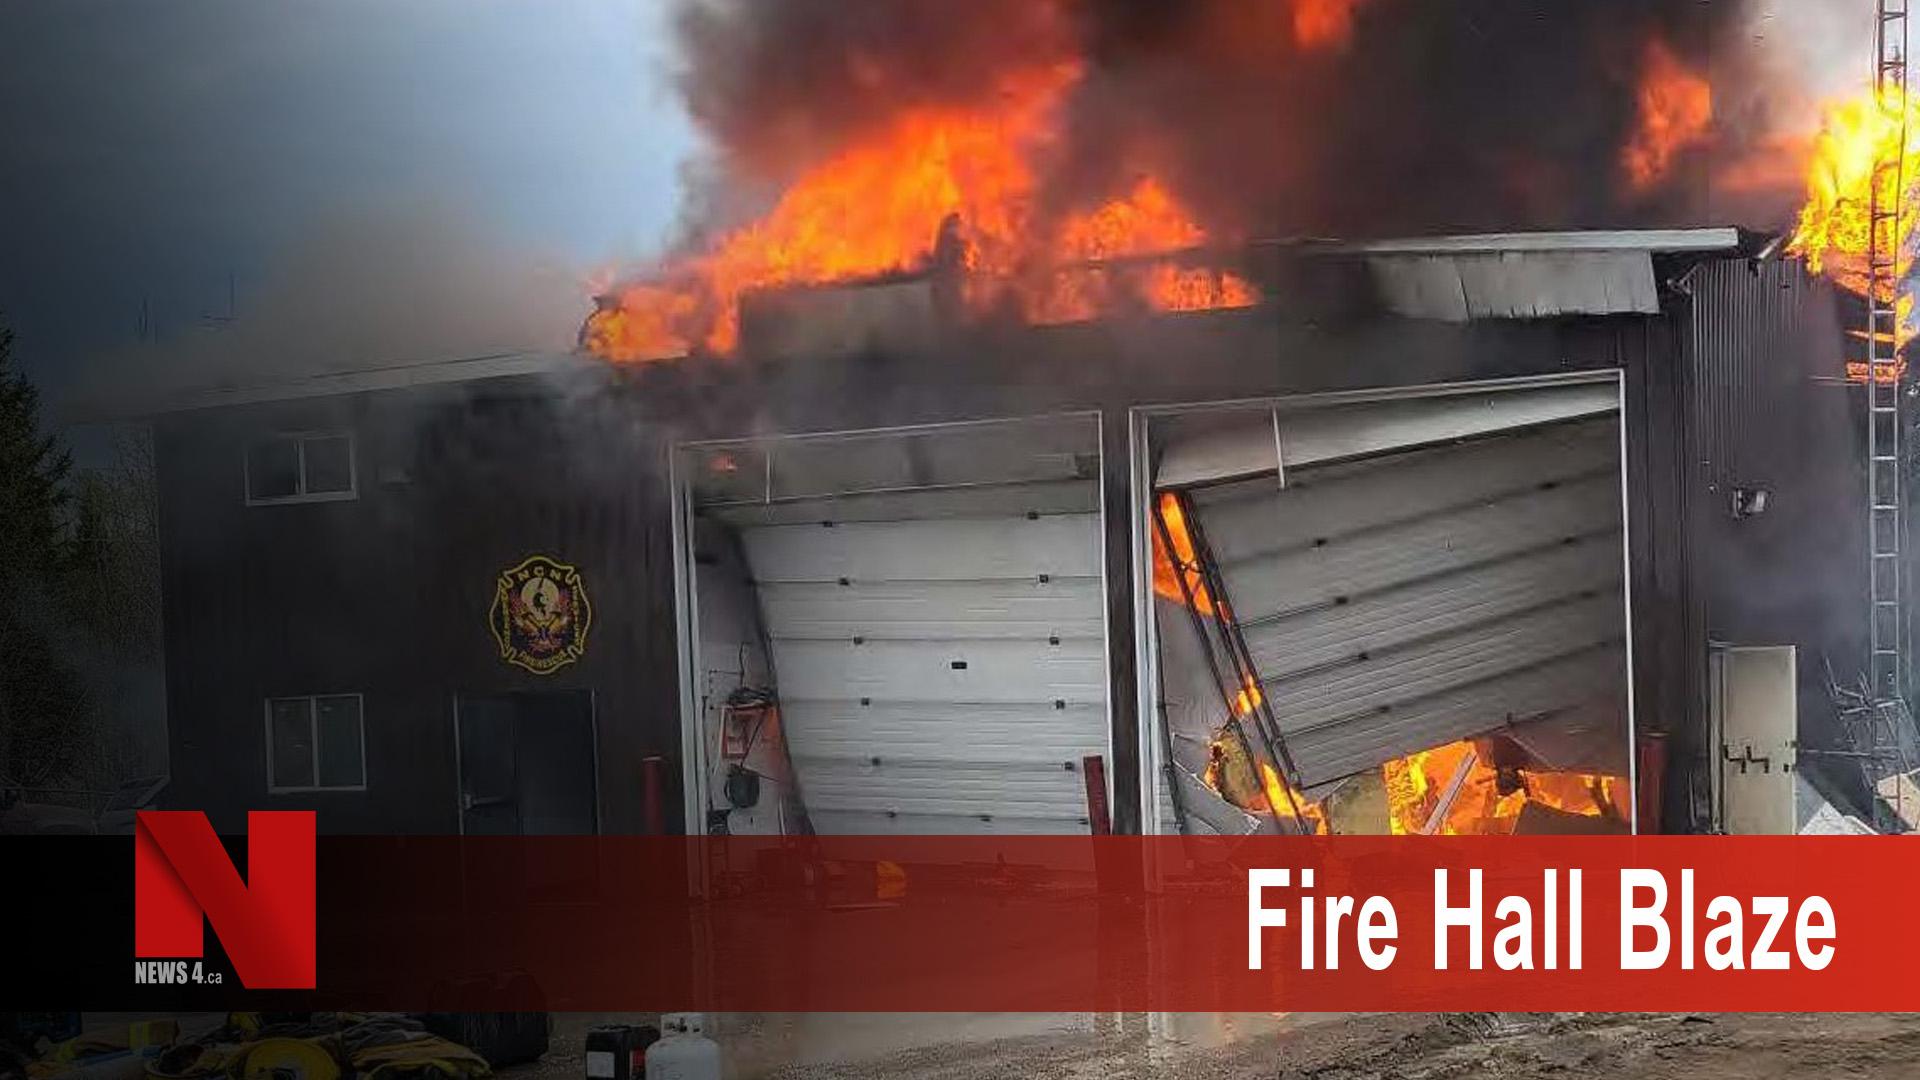 Fire hall Blaze